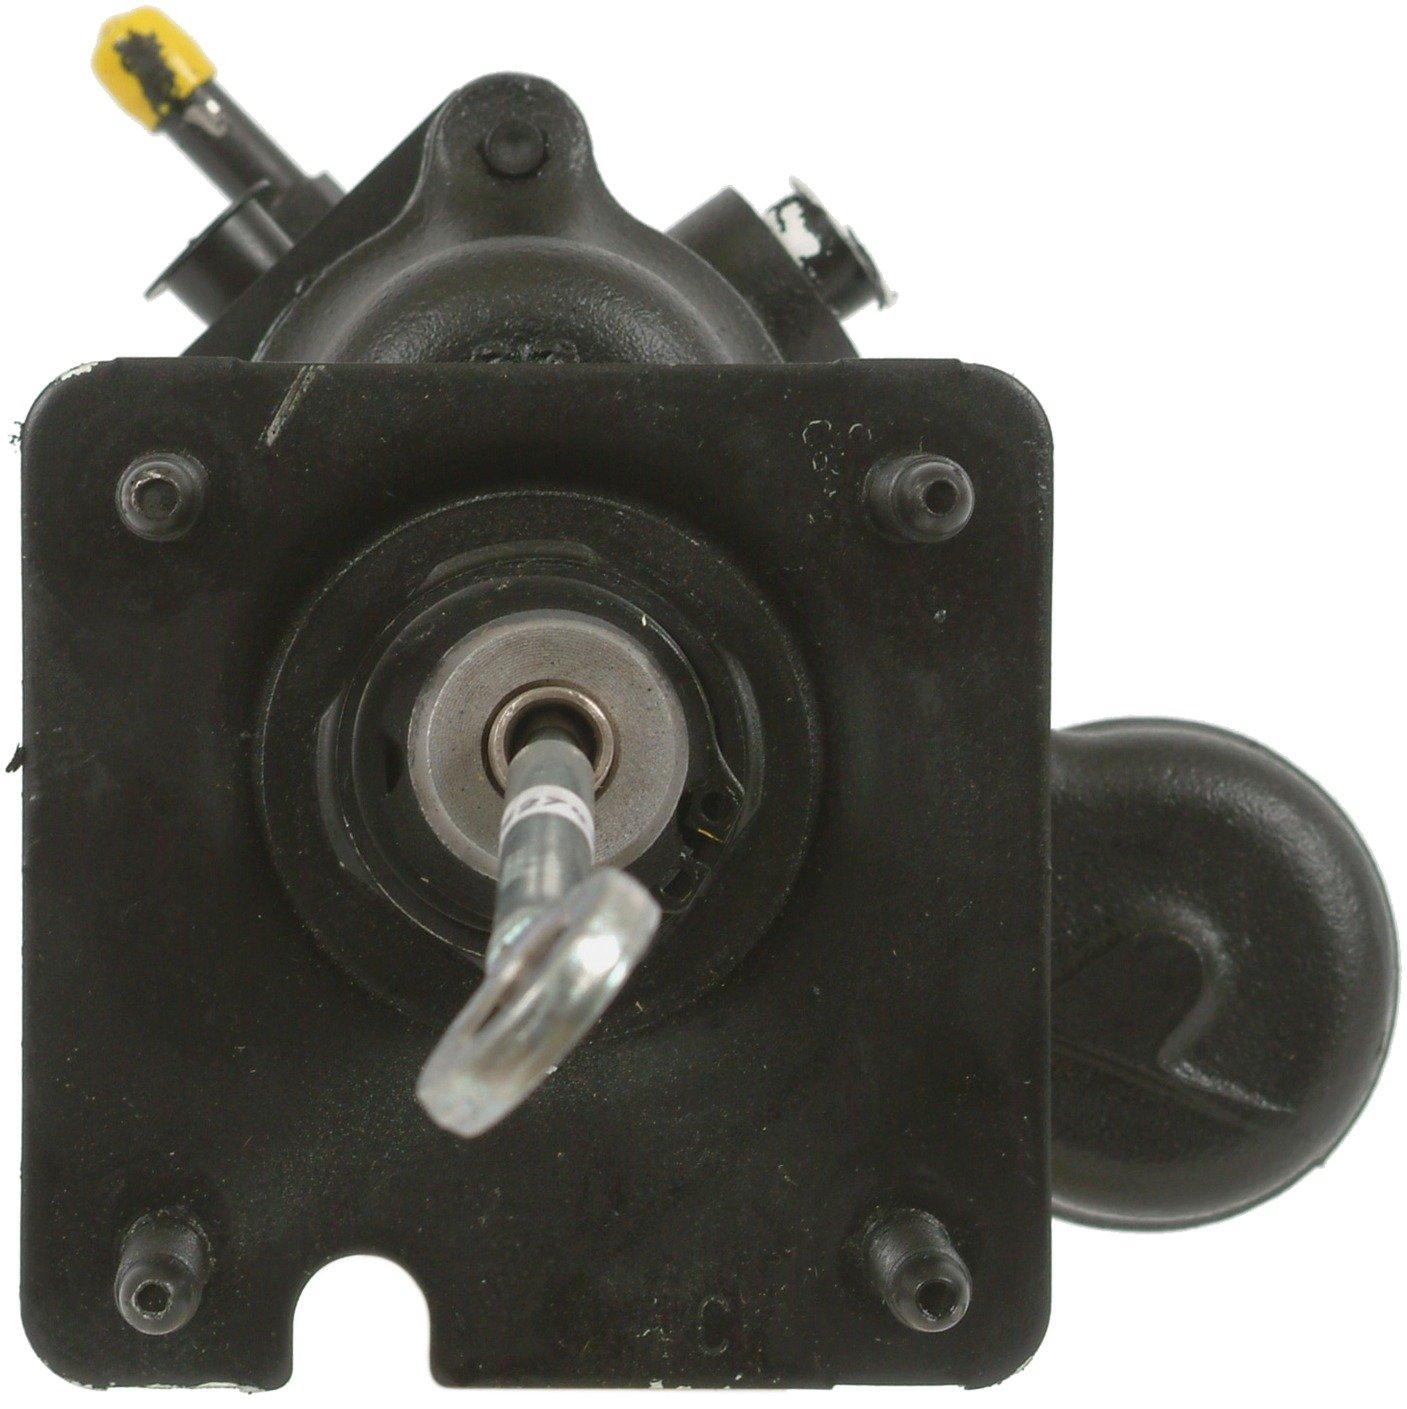 A1 Cardone 52-7412 Remanufactured Hydraulic Power Brake Booster